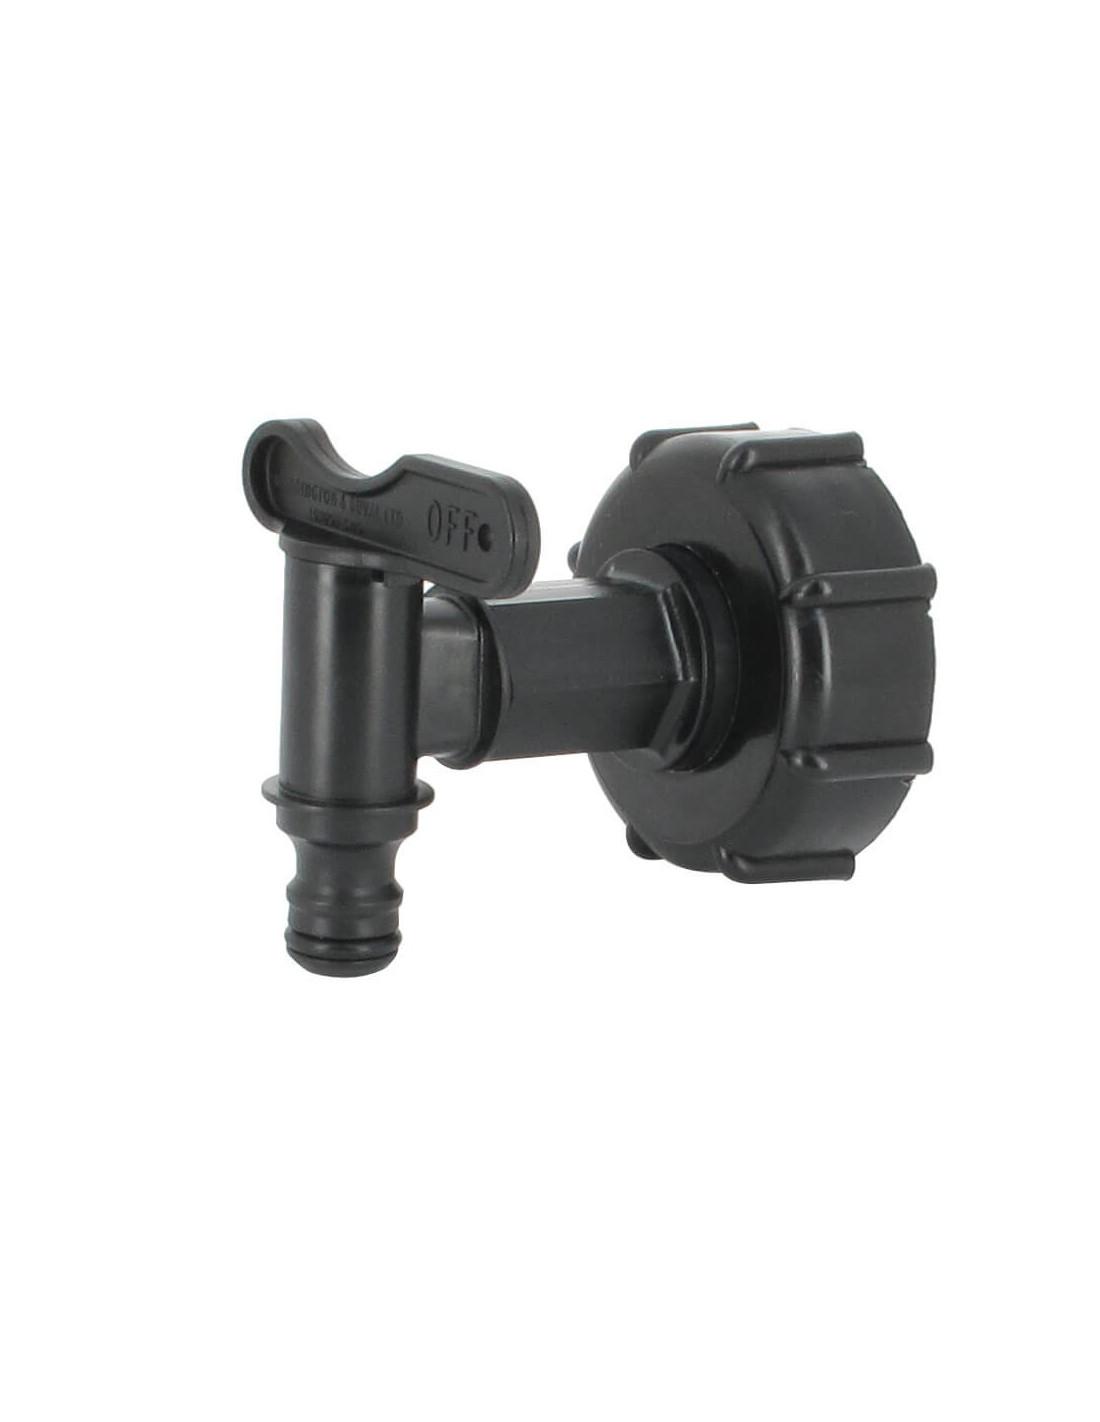 robinet raccord pour cuve eau 1000l 2 s60x6 robinet. Black Bedroom Furniture Sets. Home Design Ideas